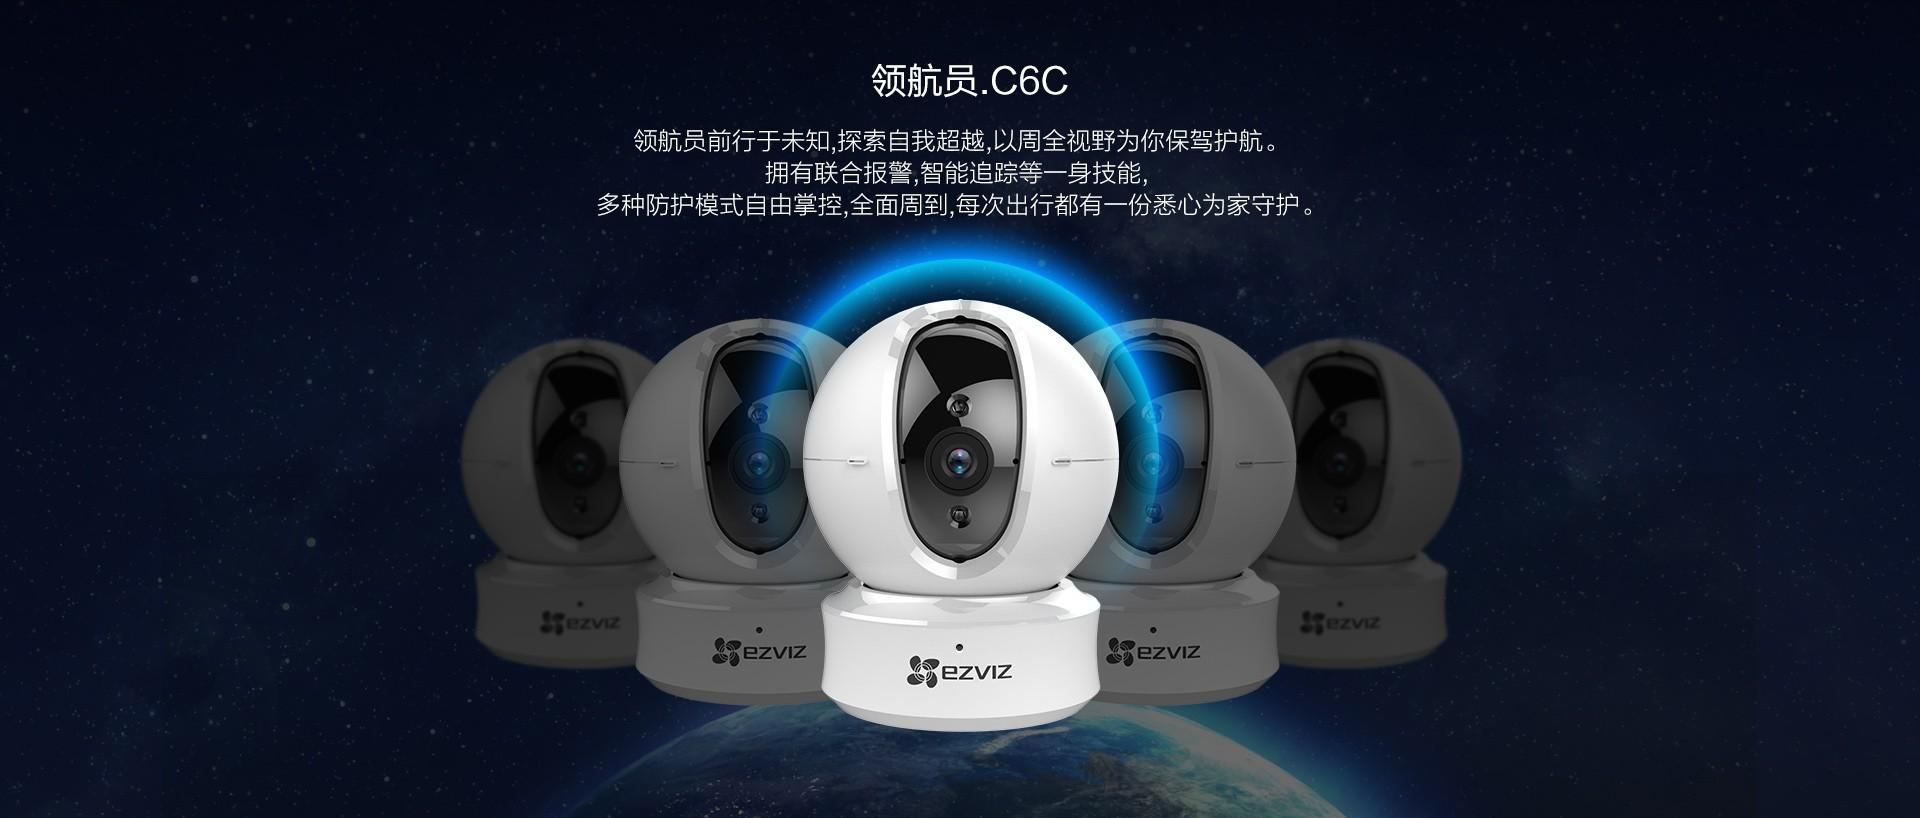 C6C.jpg